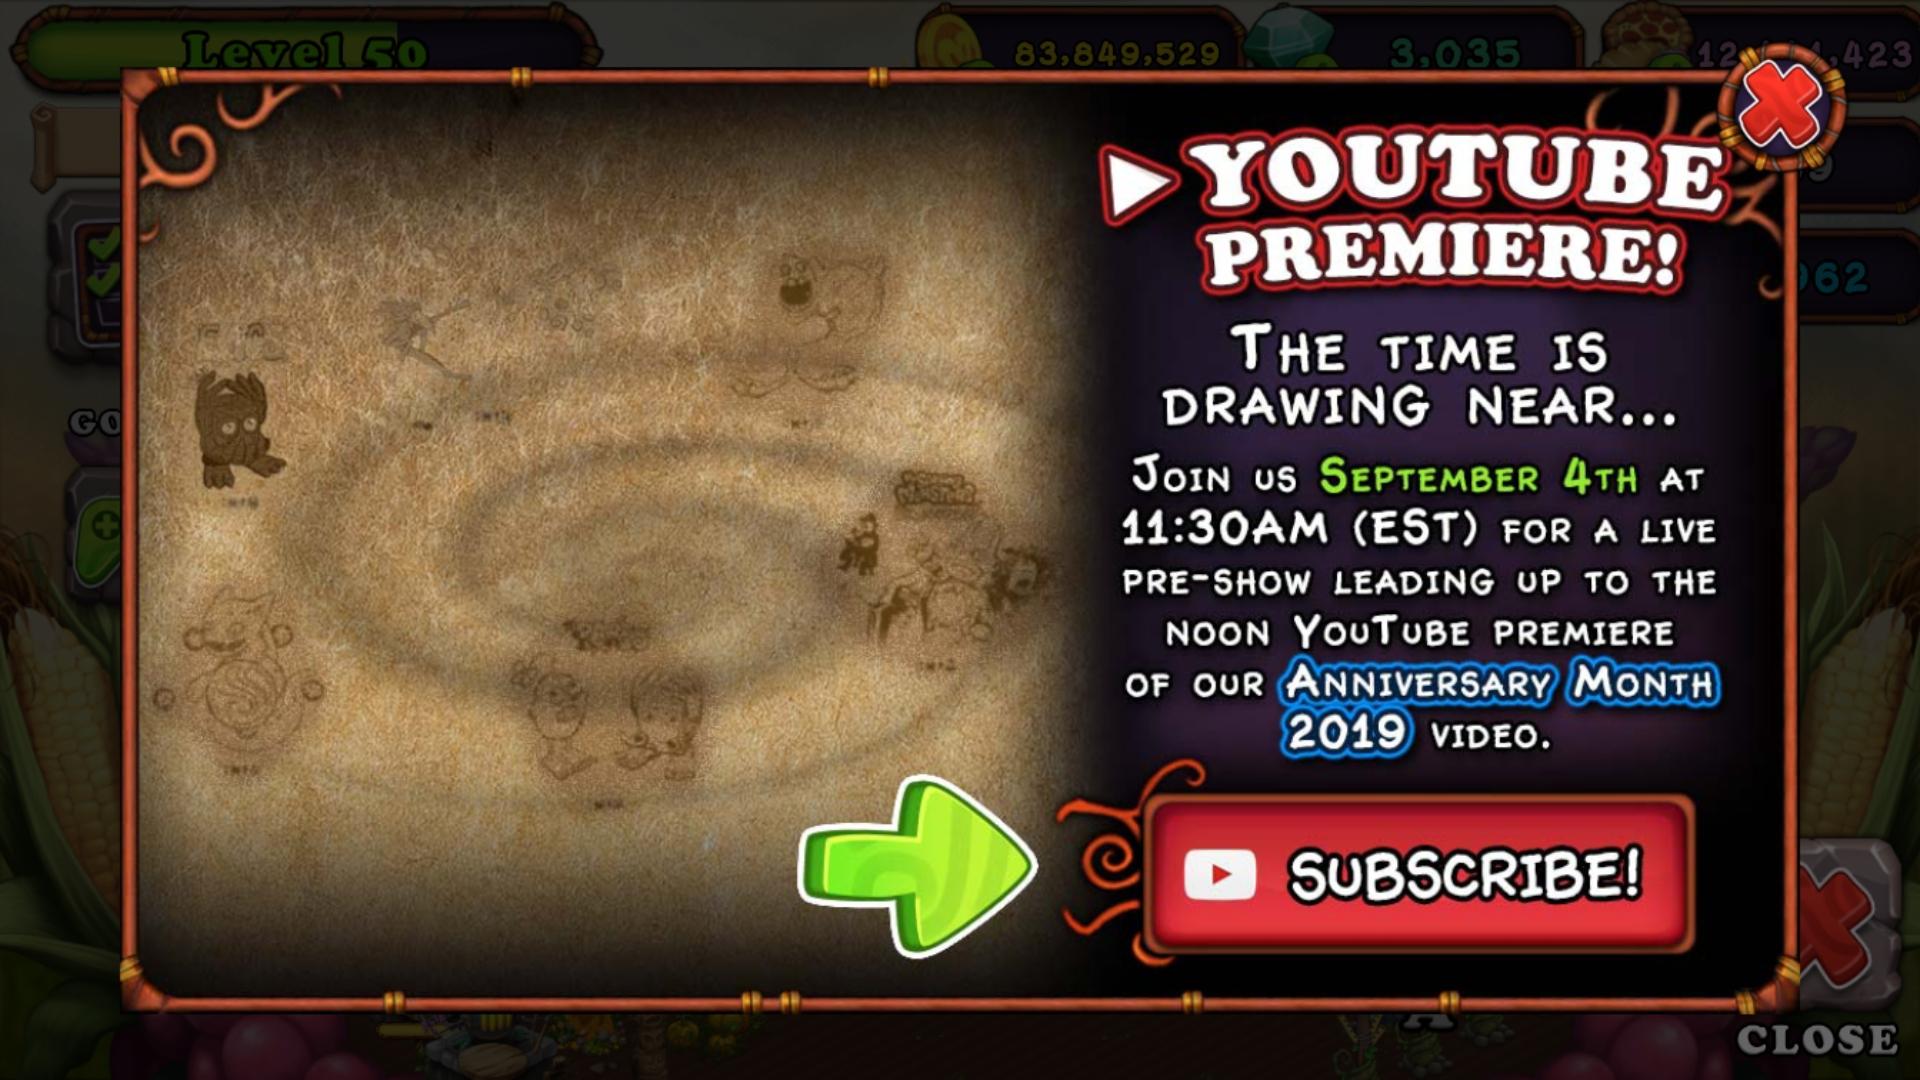 Youtube Premiere Tomorrow!